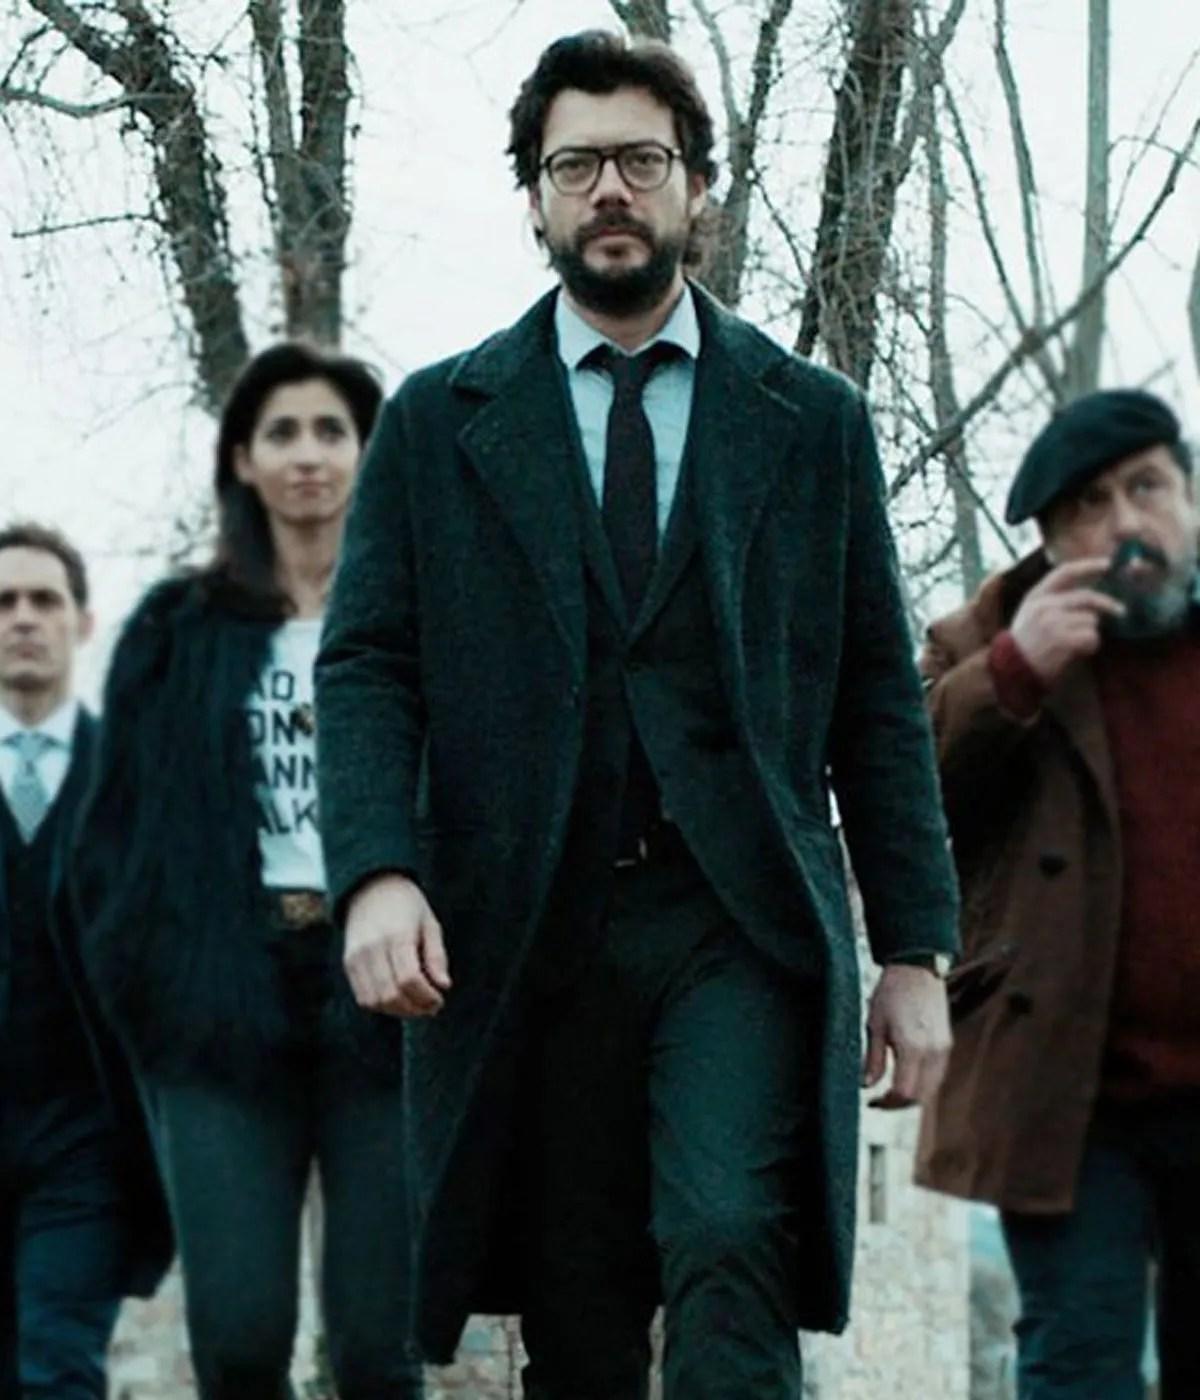 alvaro-morte-money-heist-the-profesor-coat